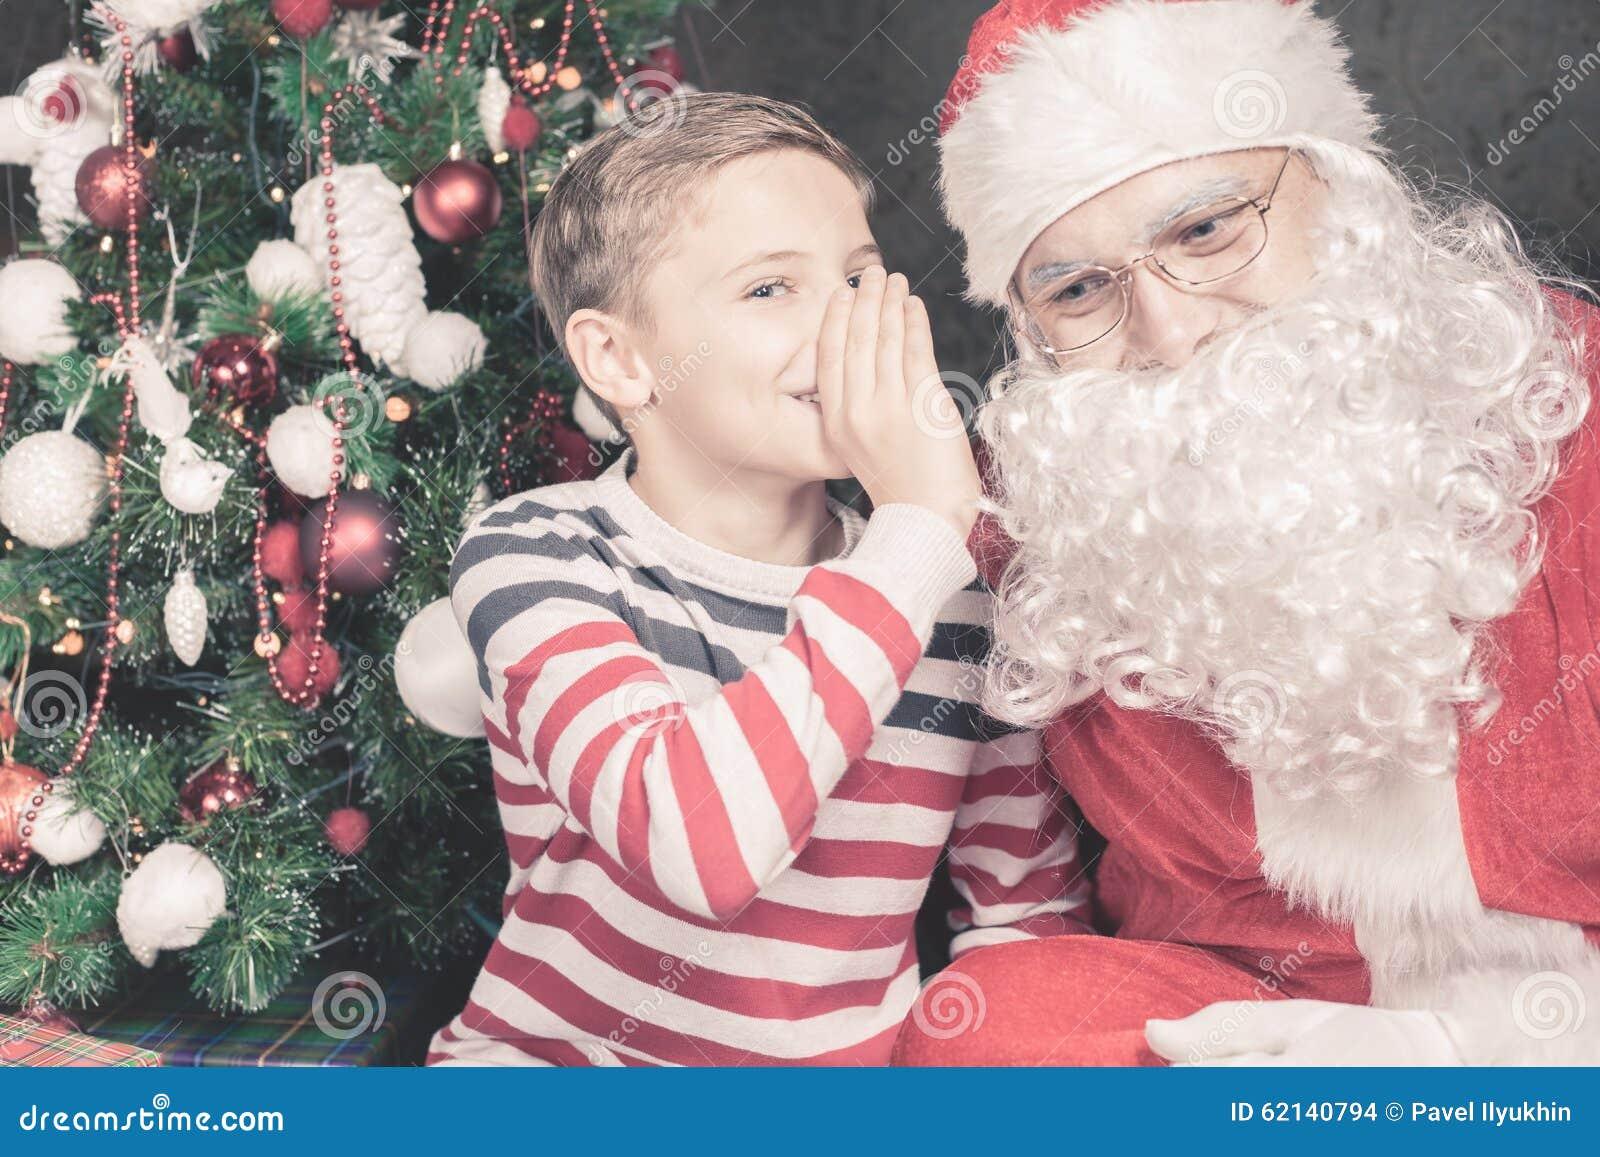 Little Boy Talk To Santa Claus Wishlist, Gifts, Christmas Night ...